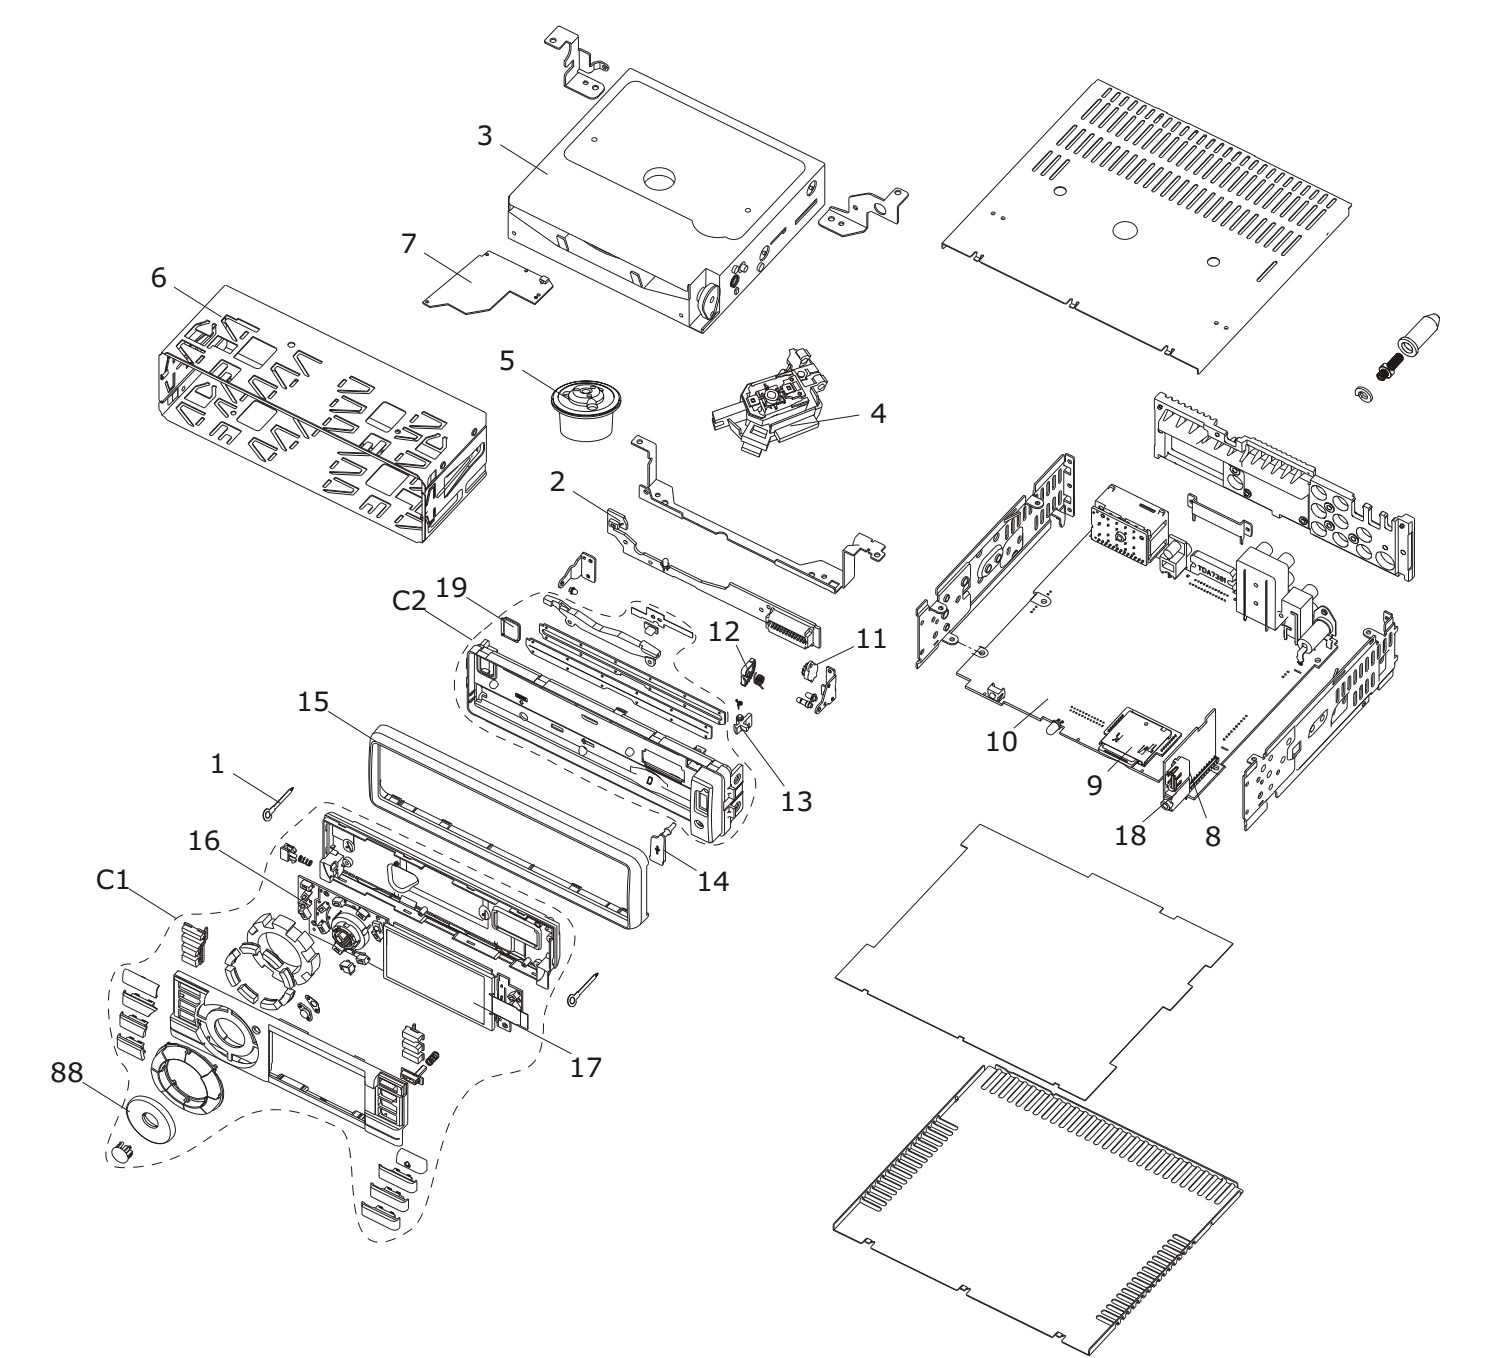 Philco PCA 530 Auto Radio schematic diagram, firmware